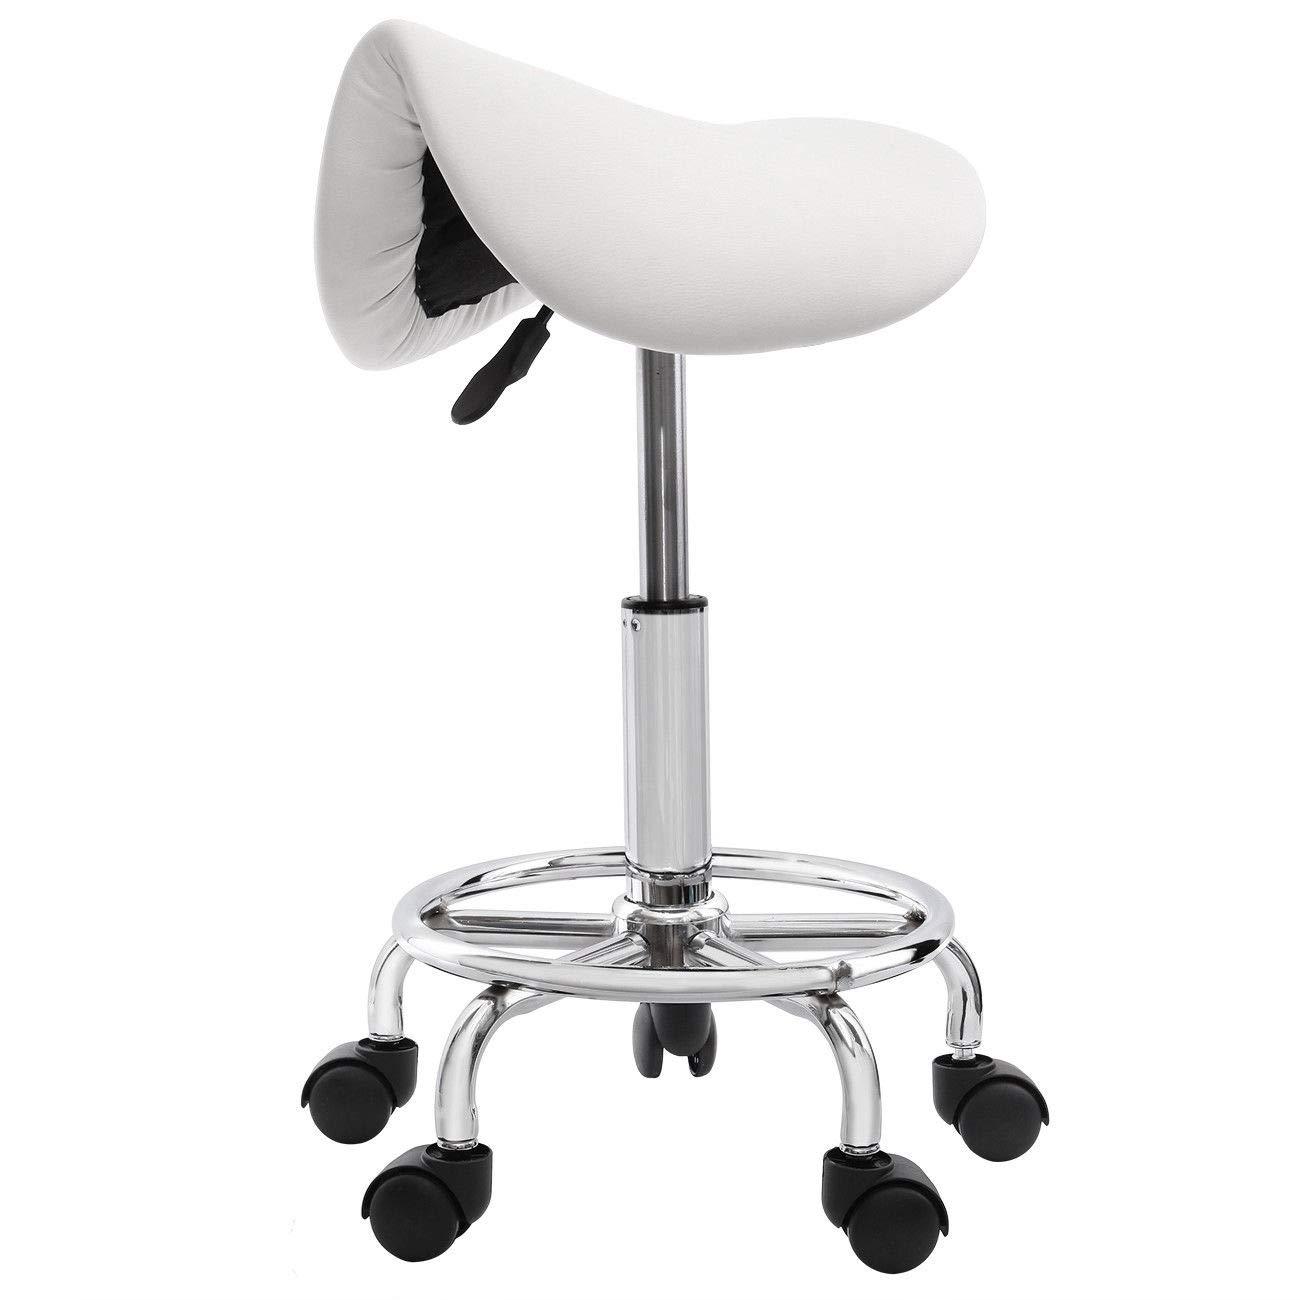 Rolling Hydraulic Ergonomic Saddle Seat Bar Salon Barber Chair Hair Styling Beauty Spa Shampoo Hair Salon Spa Saddle Stool Pedicure/Manicure Nail Technician Massage Equipment | White